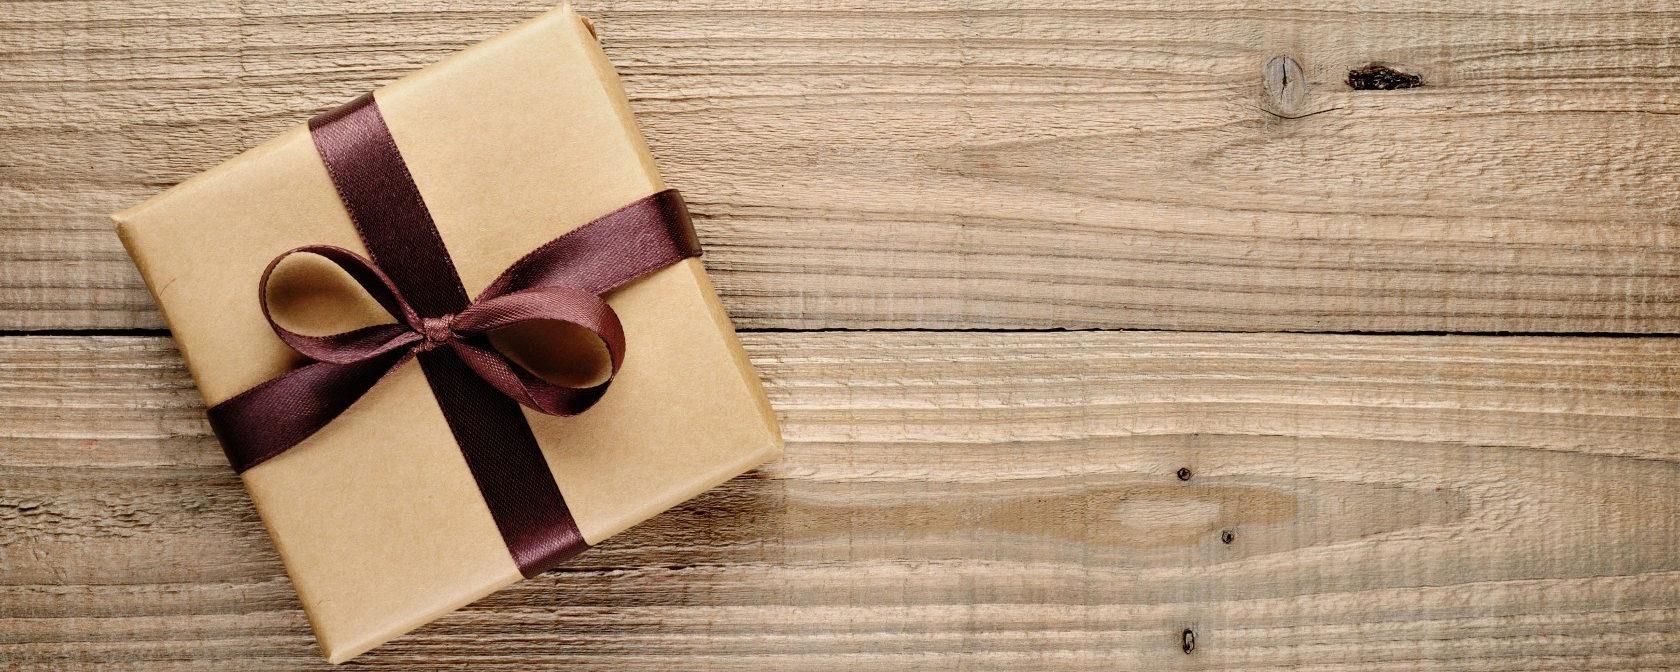 Какими подарками задаривают веб моделей